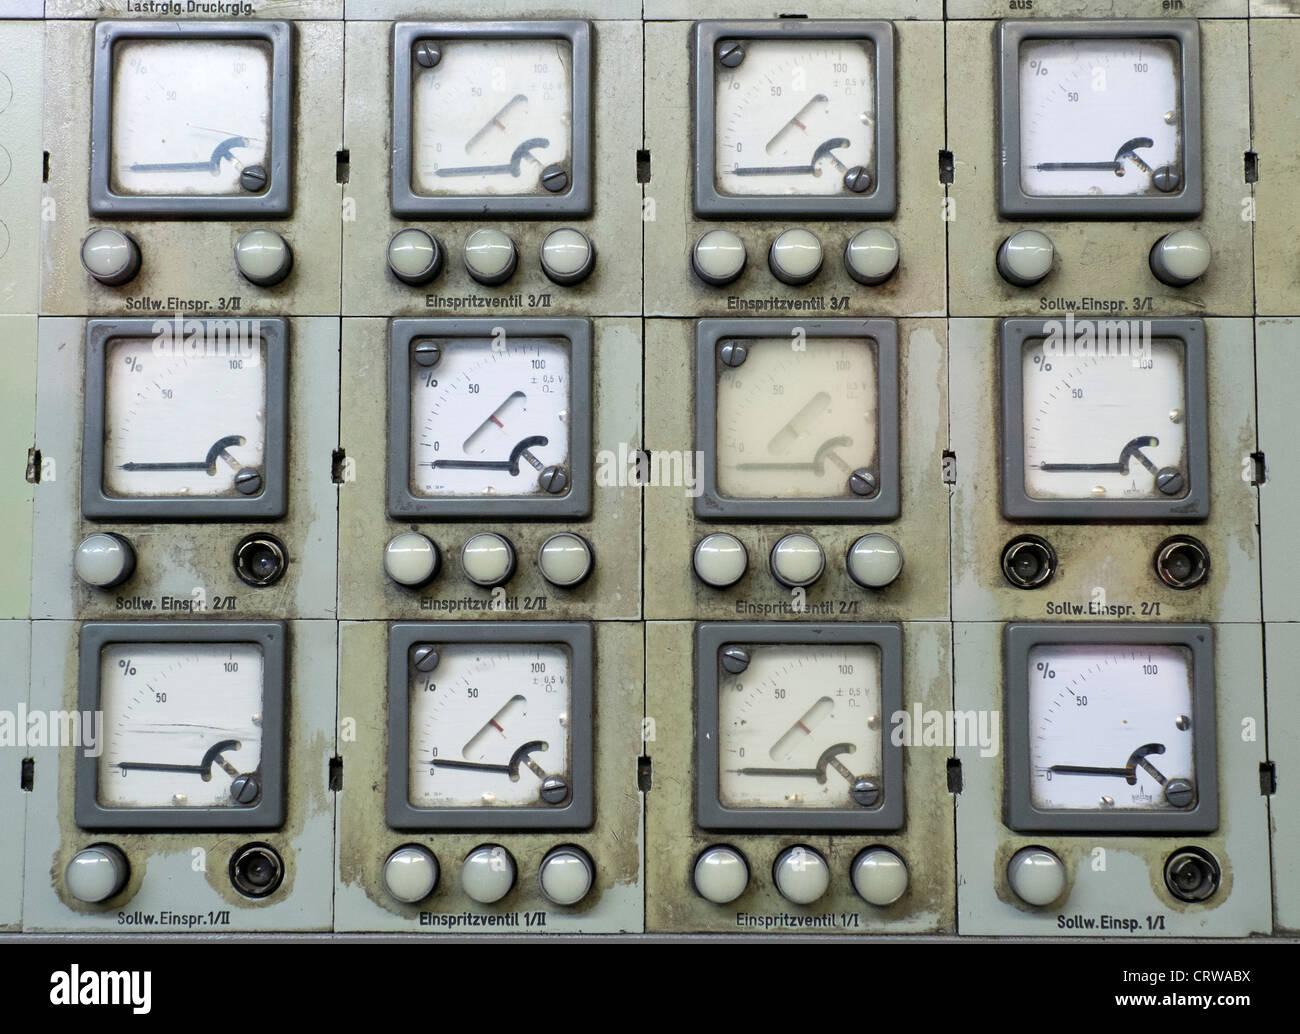 Power station exhibit at Deutsche Arbeitsschutzausstellung DASA or German Museum of Occupational Health and Safety - Stock Image